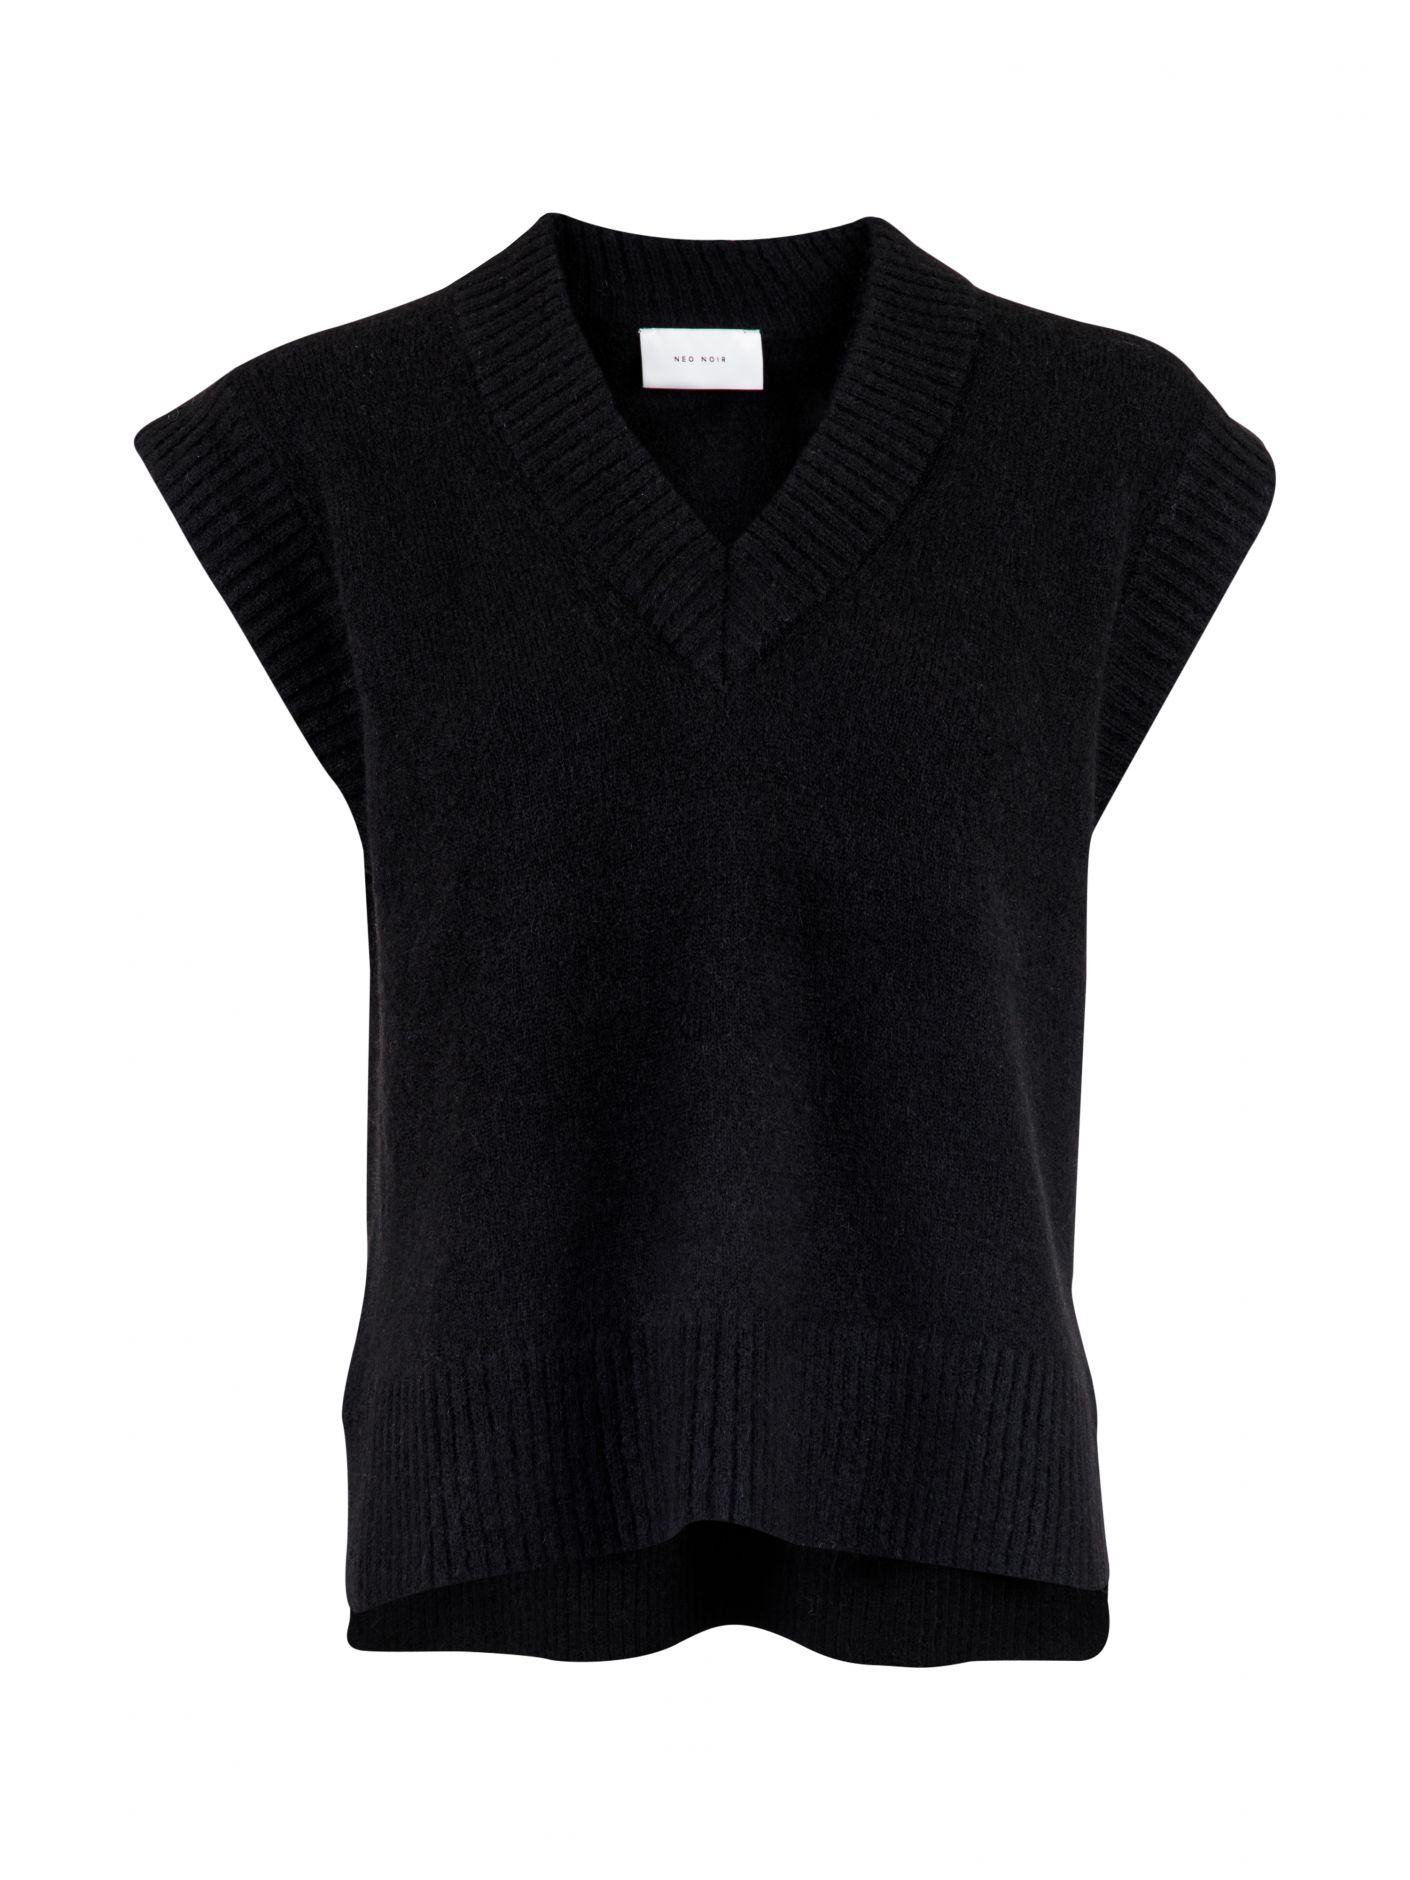 Neo Noir Kaylee strik vest, black, x-small